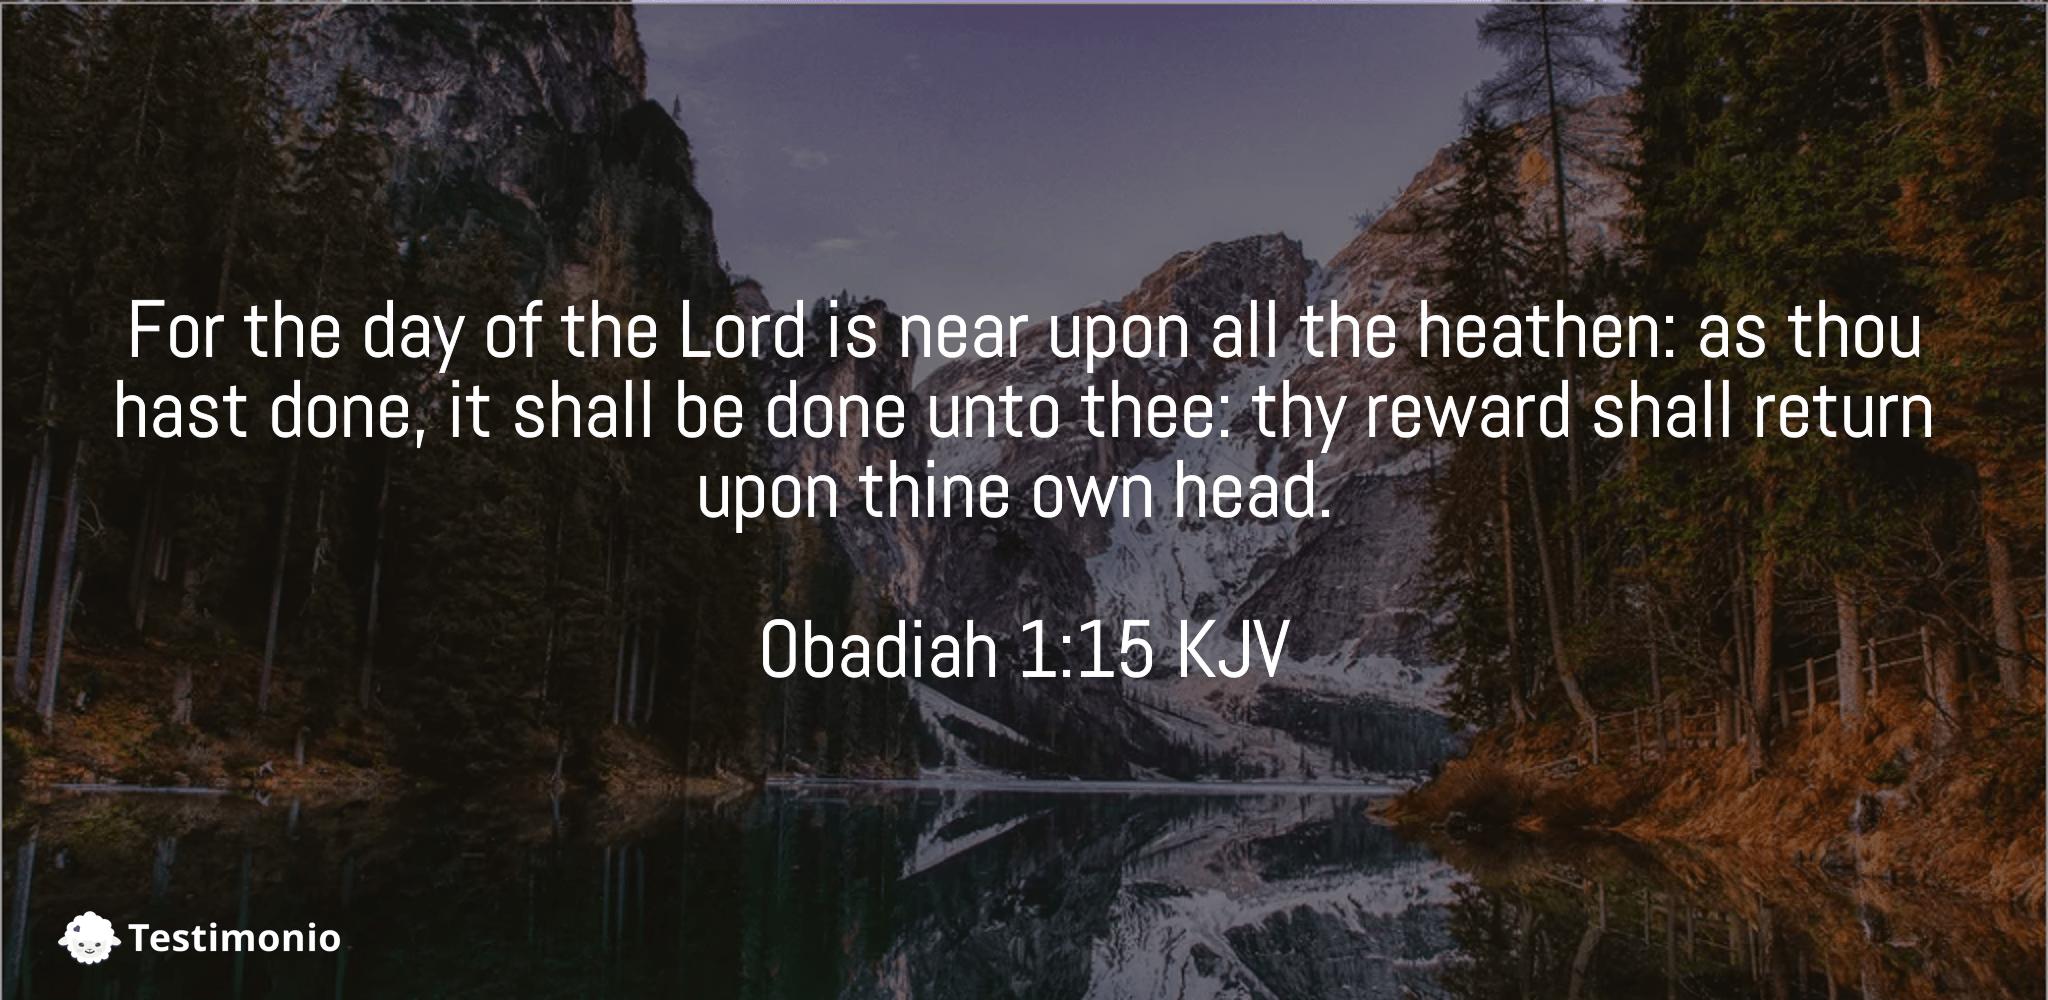 Obadiah 1:15